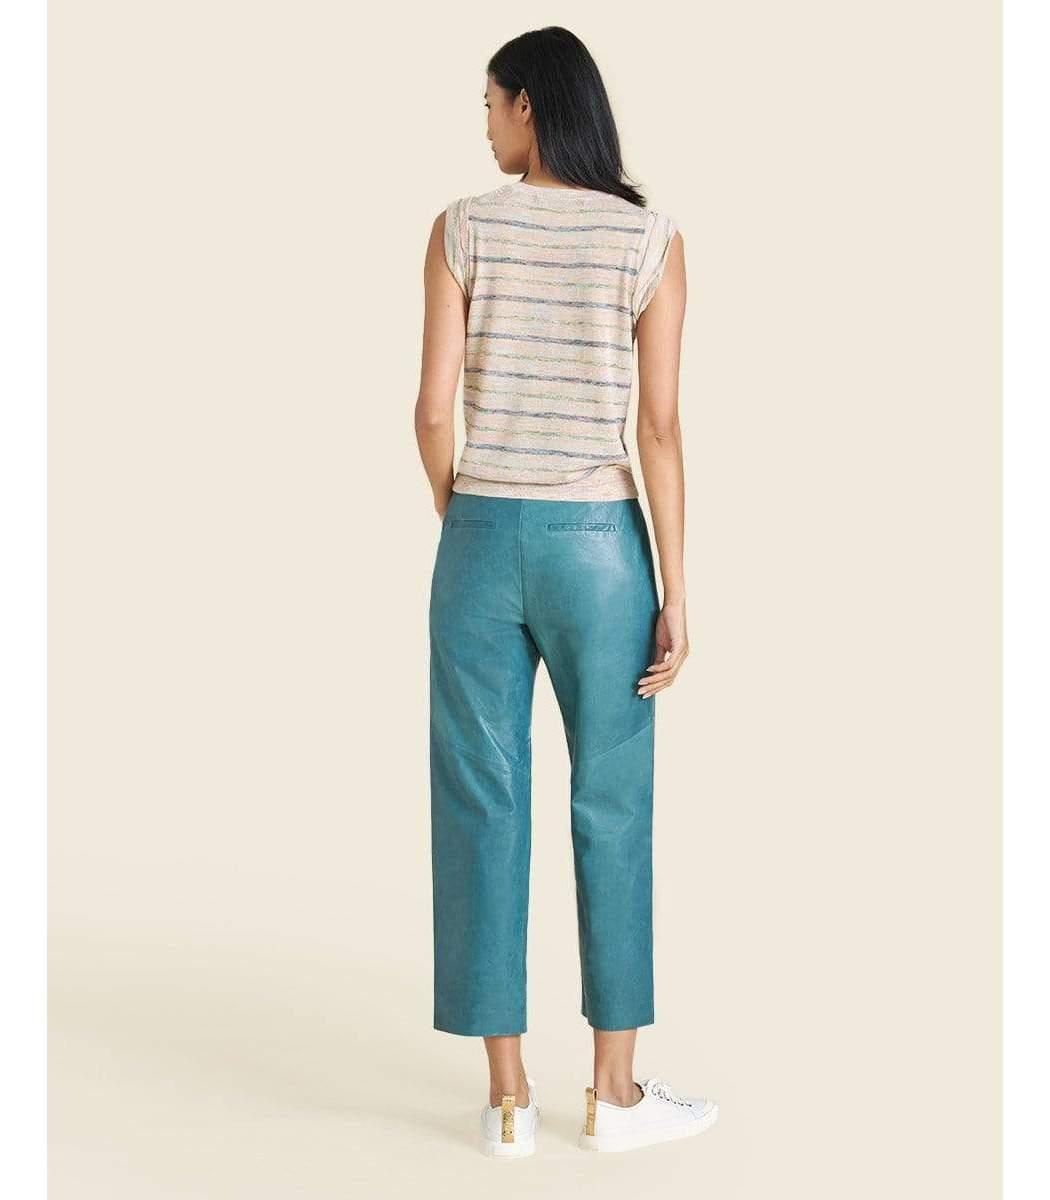 VERONICA BEARD Pants Enrica Leather Pant